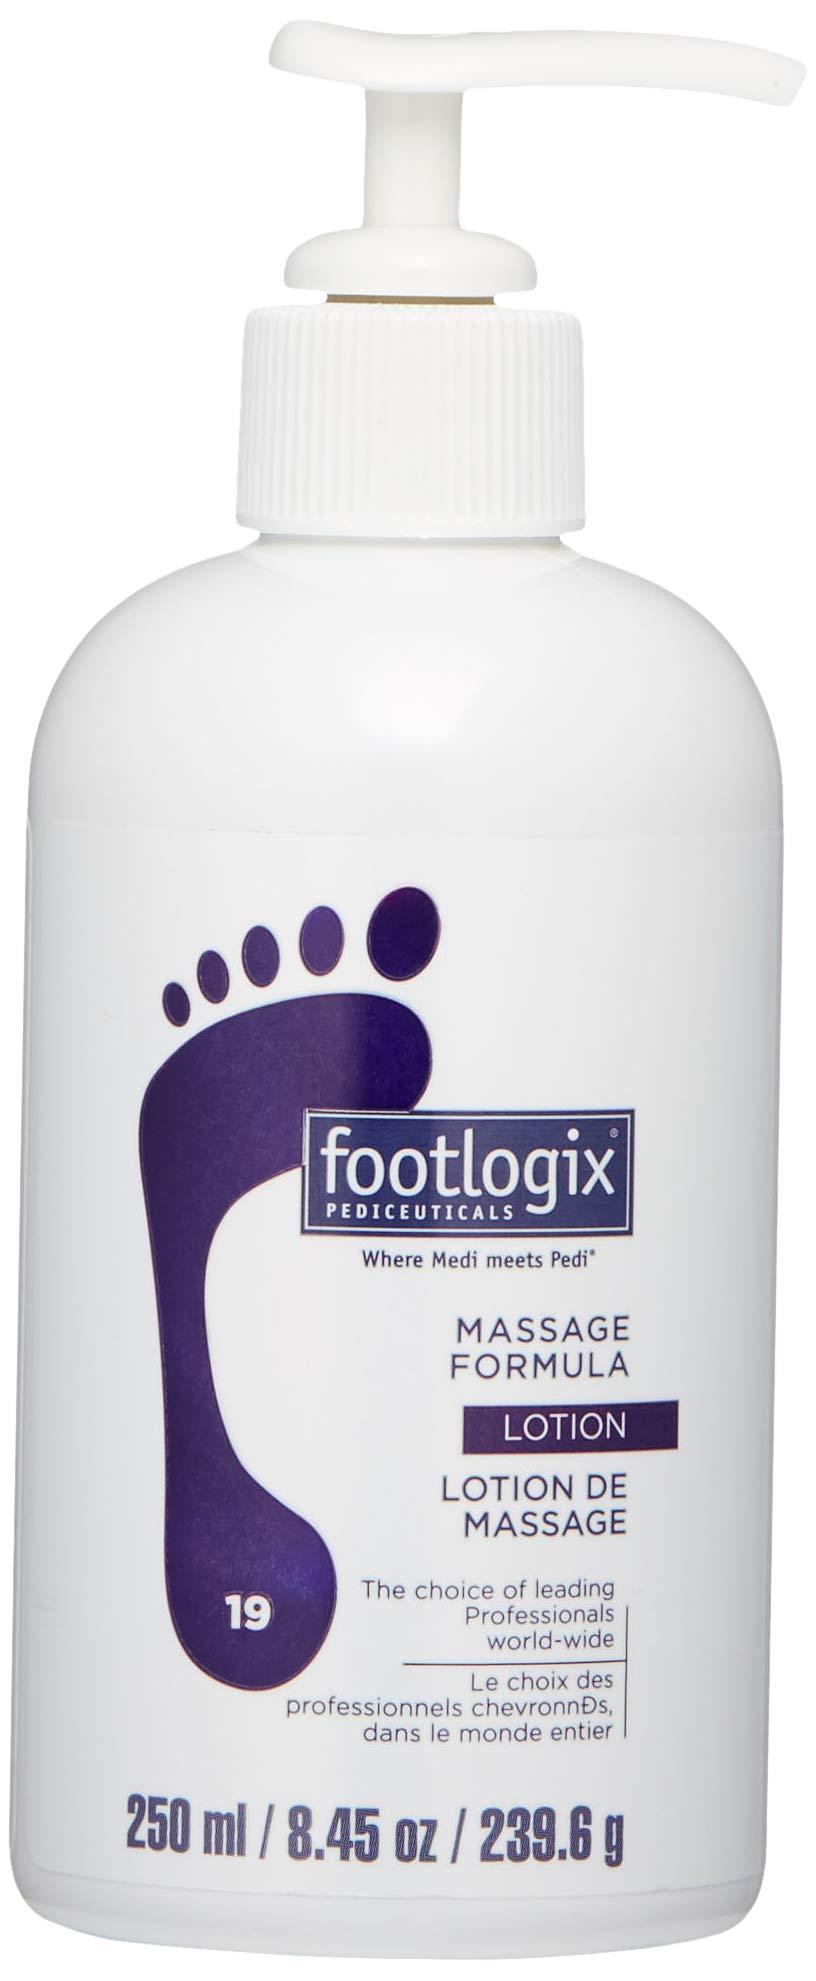 FOOTLOGIX Massage Formula Lotion, 8.45 oz